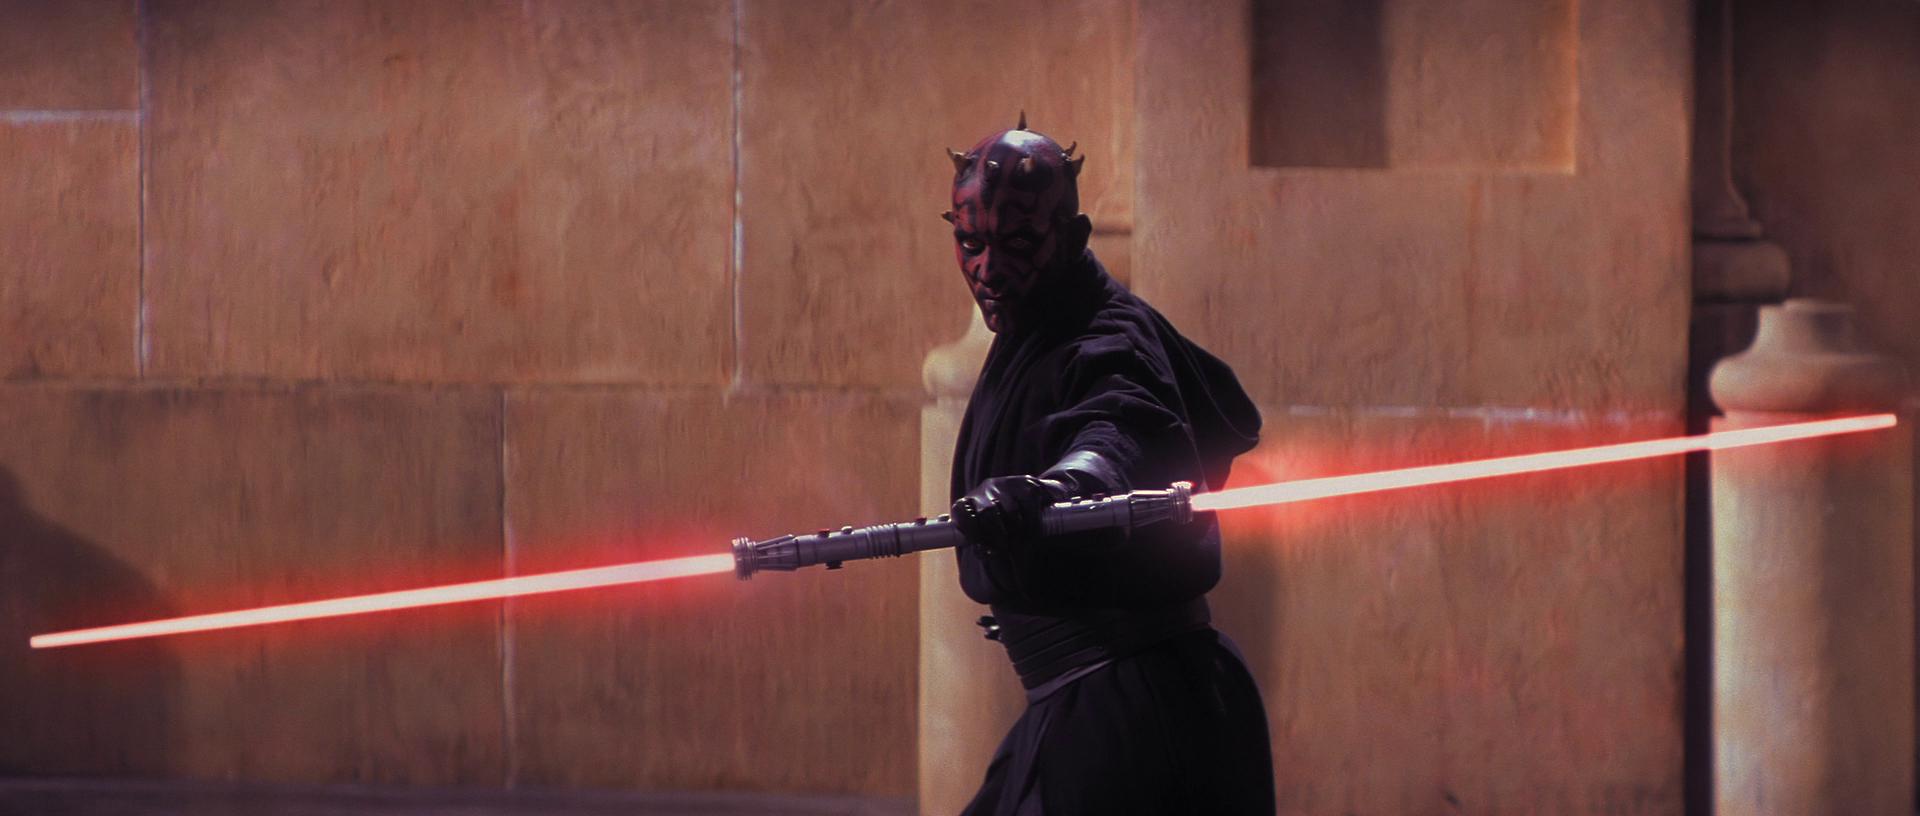 Darth Maul Lightsaber Reveal Png 1920 816 Darth Maul Star Wars Film Star Wars Light Saber